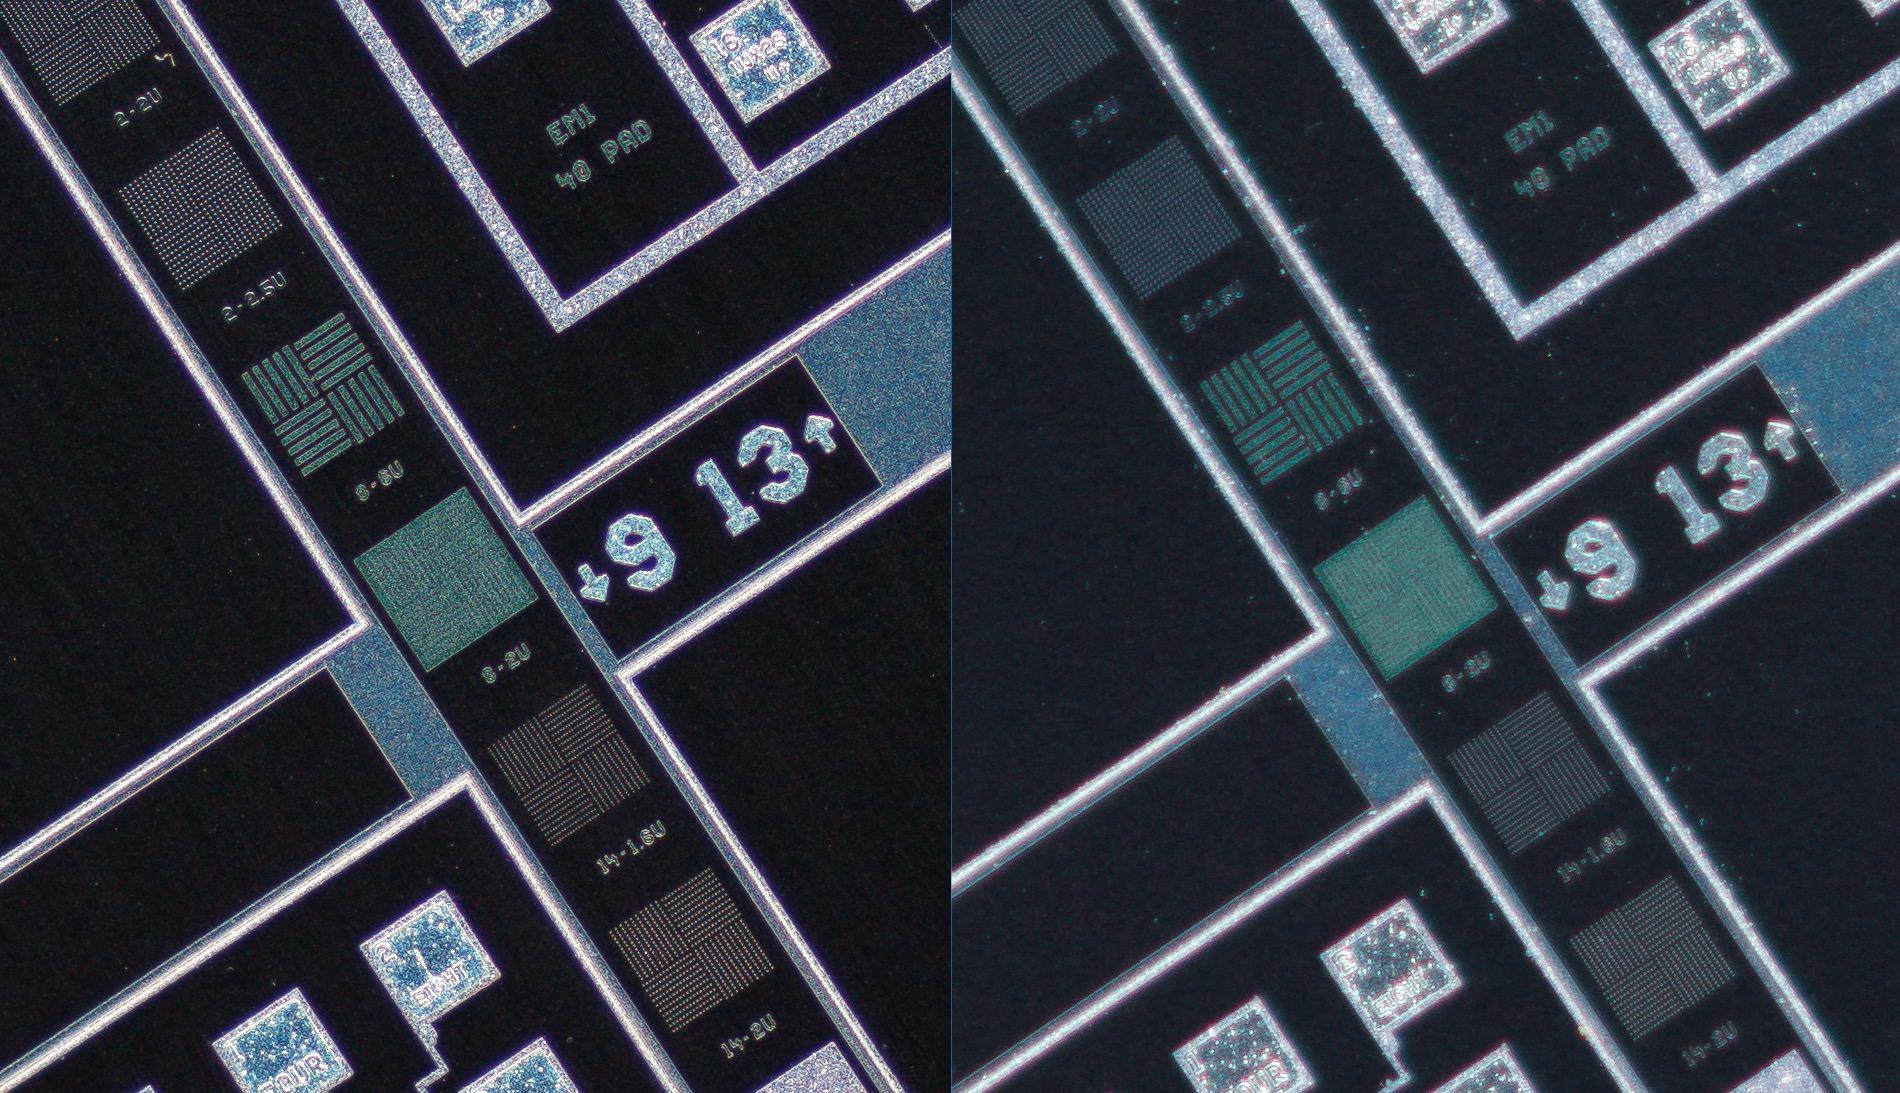 Nikon CFI Super Fluor 4X vs Canon MP-E 65mm 1-5x Lens, center of the frame, 100% crop.Clicking on an image will open a larger version.